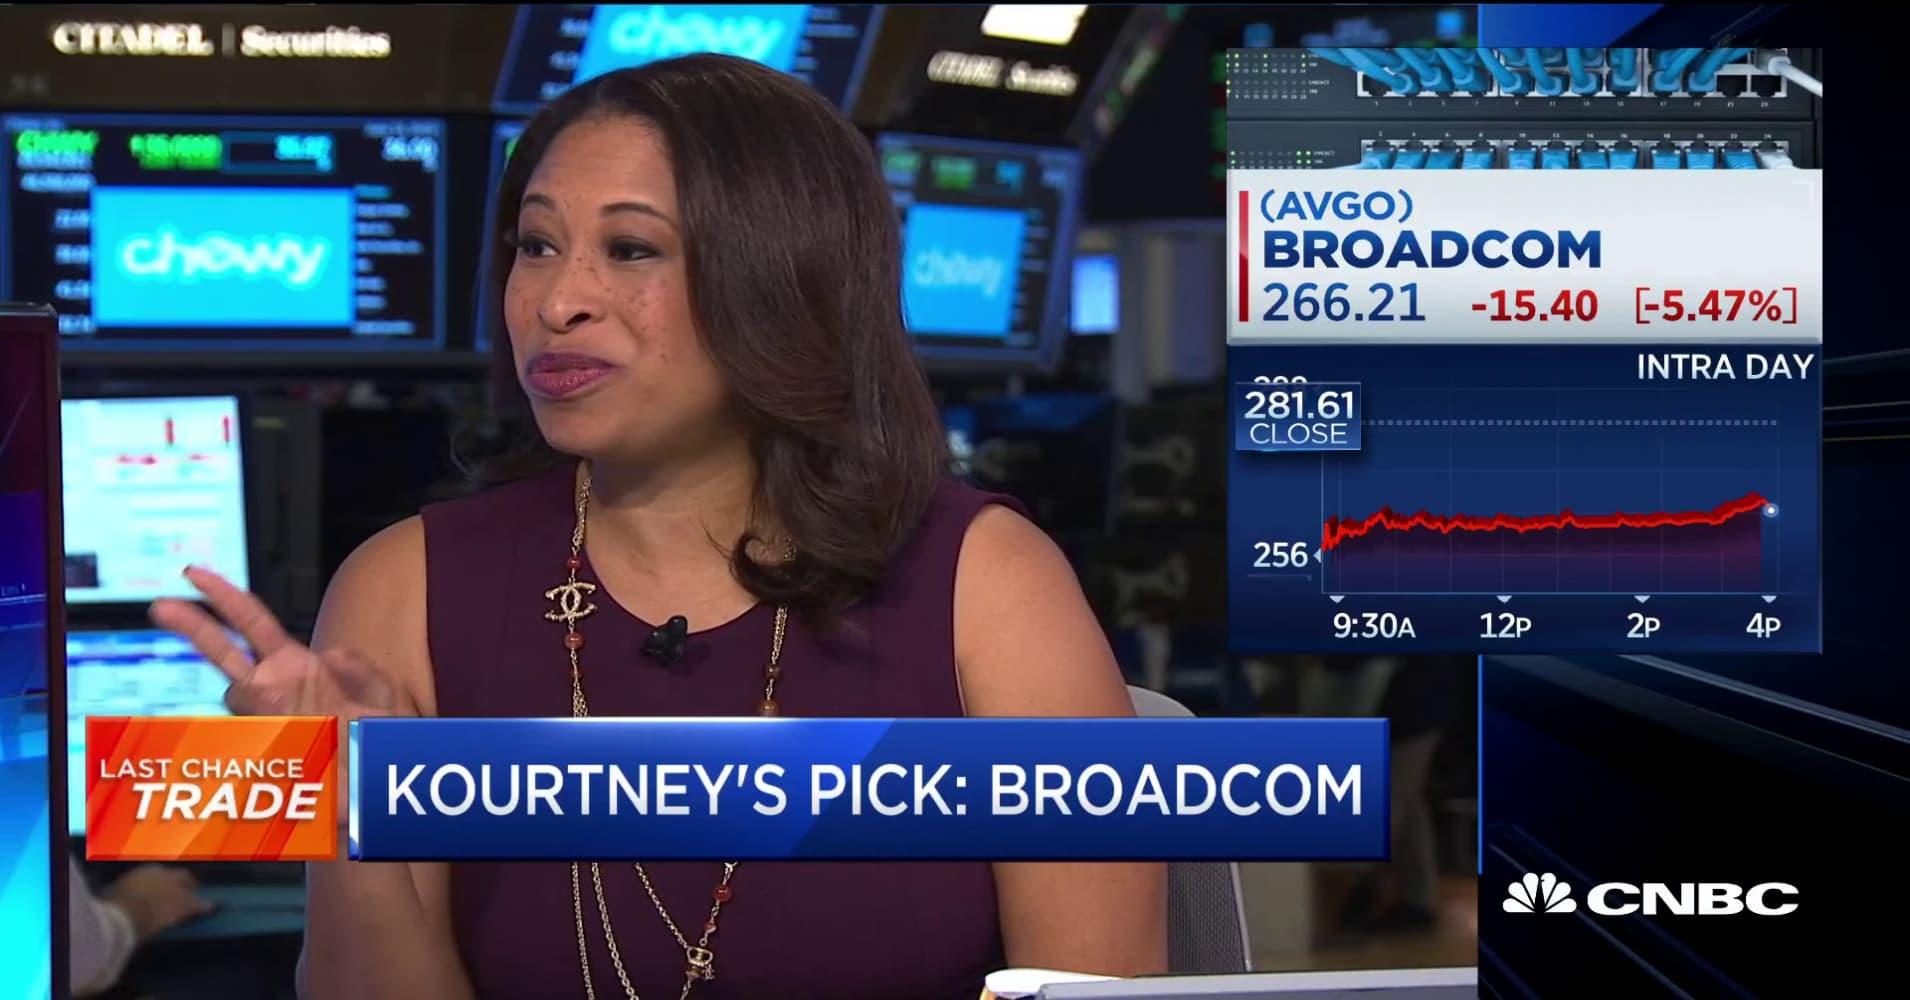 Why Loop Capital's Kourtney Gibson is bullish on Broadcom